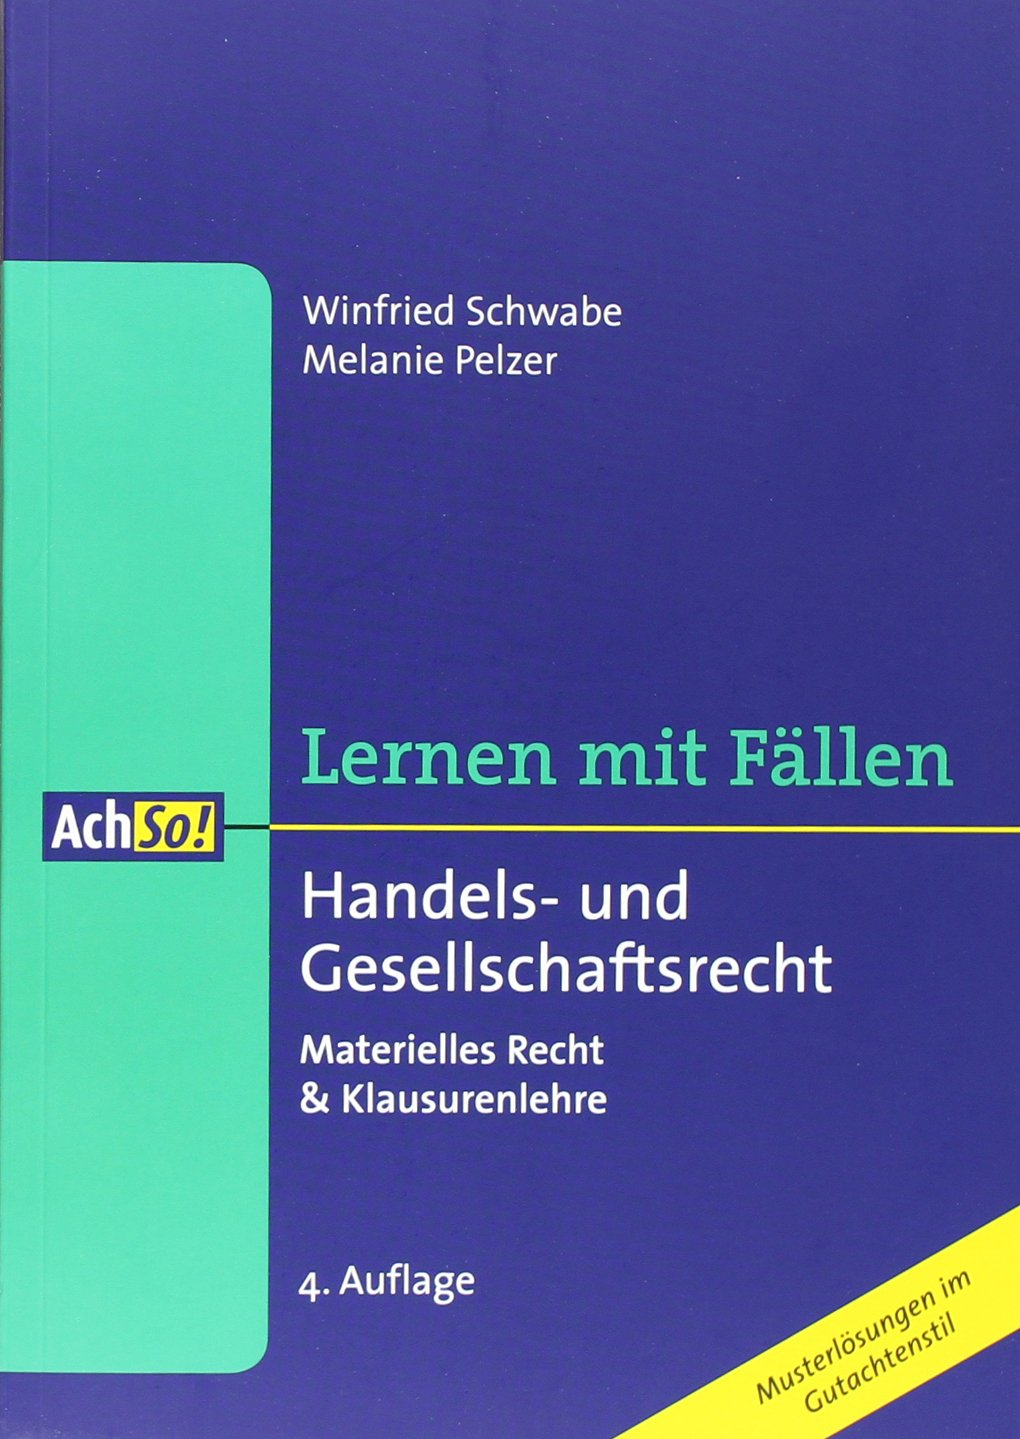 Handels- und Gesellschaftsrecht: Materielles Recht & Klausurenlehre